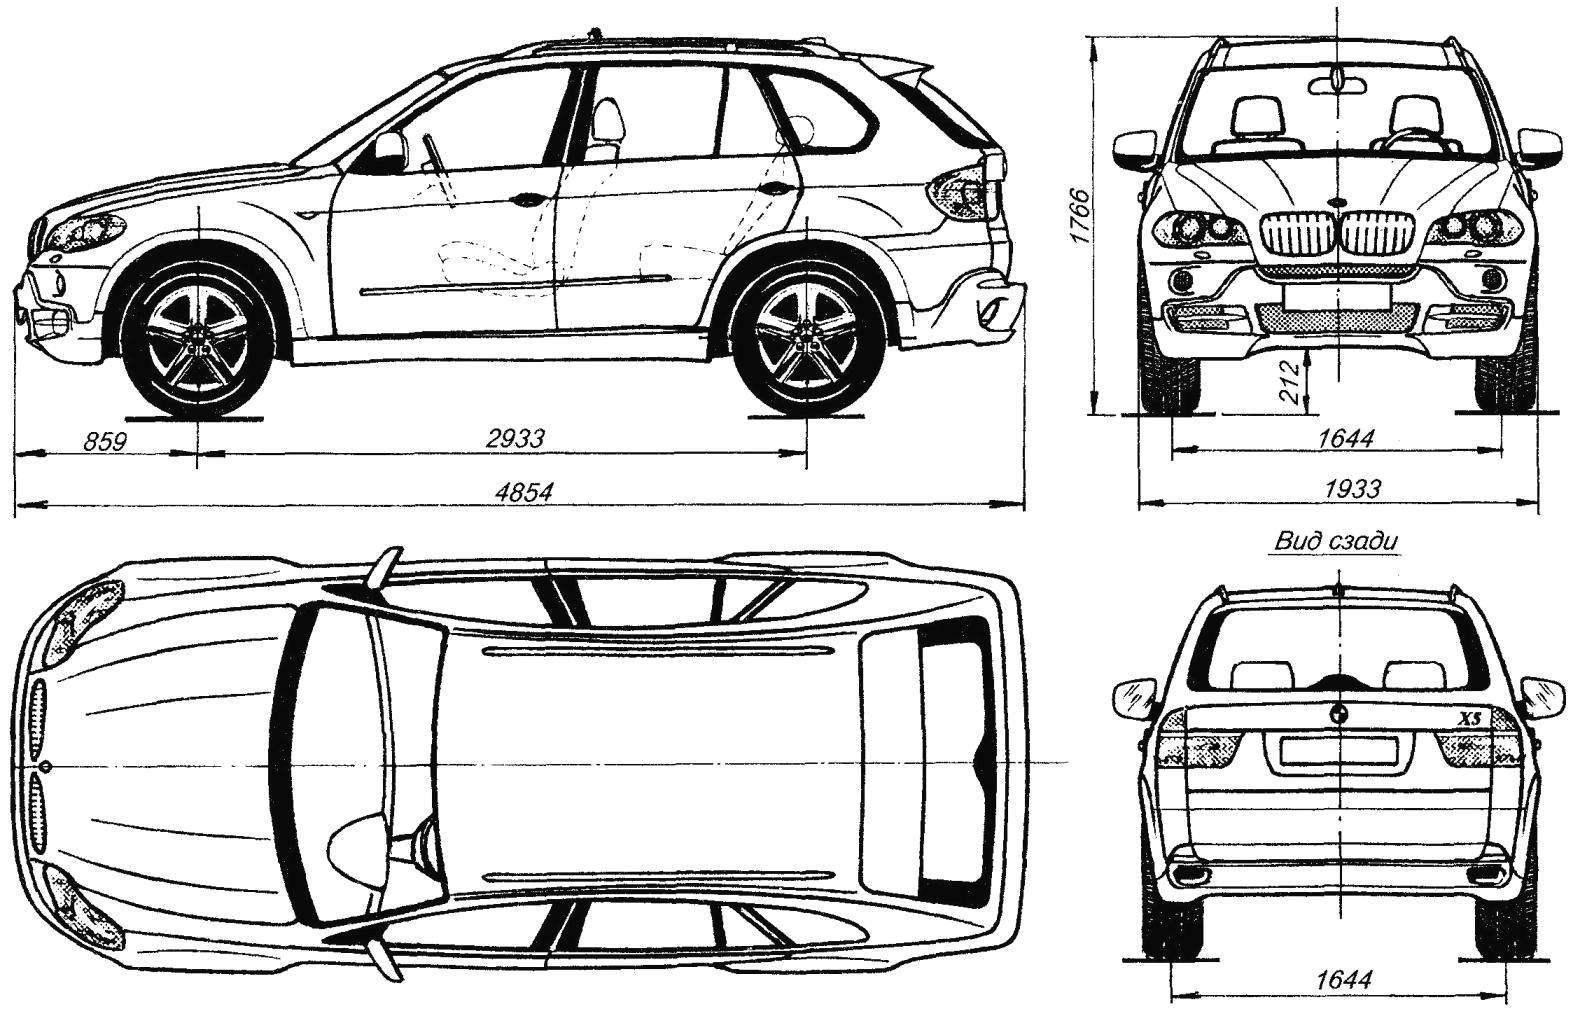 Geometry all-wheel drive car BMW X5 2006 model